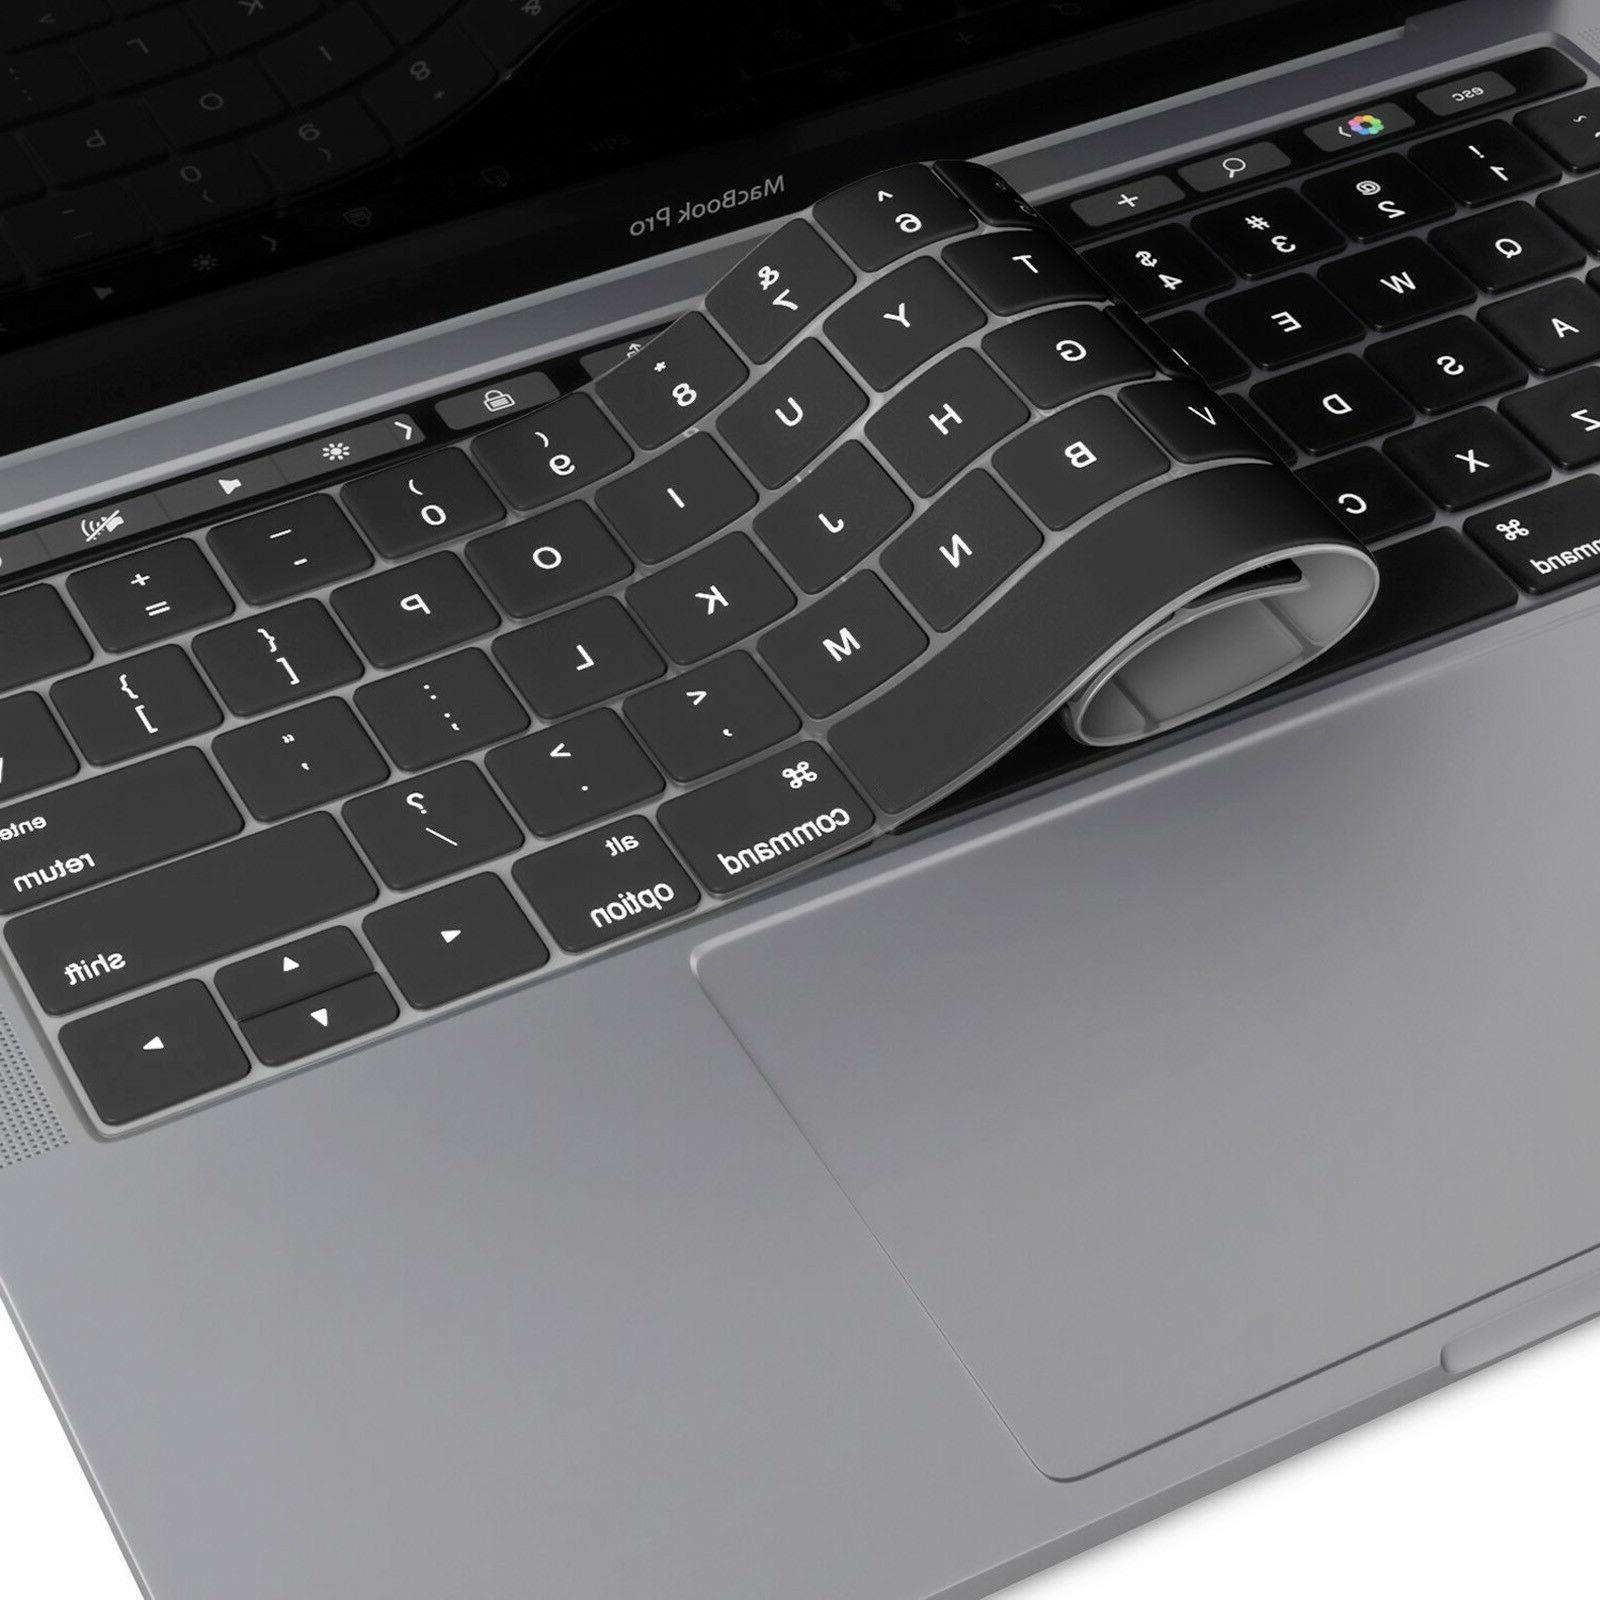 Keyboard Cover Skin for Macbook Air Pro 11 12 13 15 TouchBar